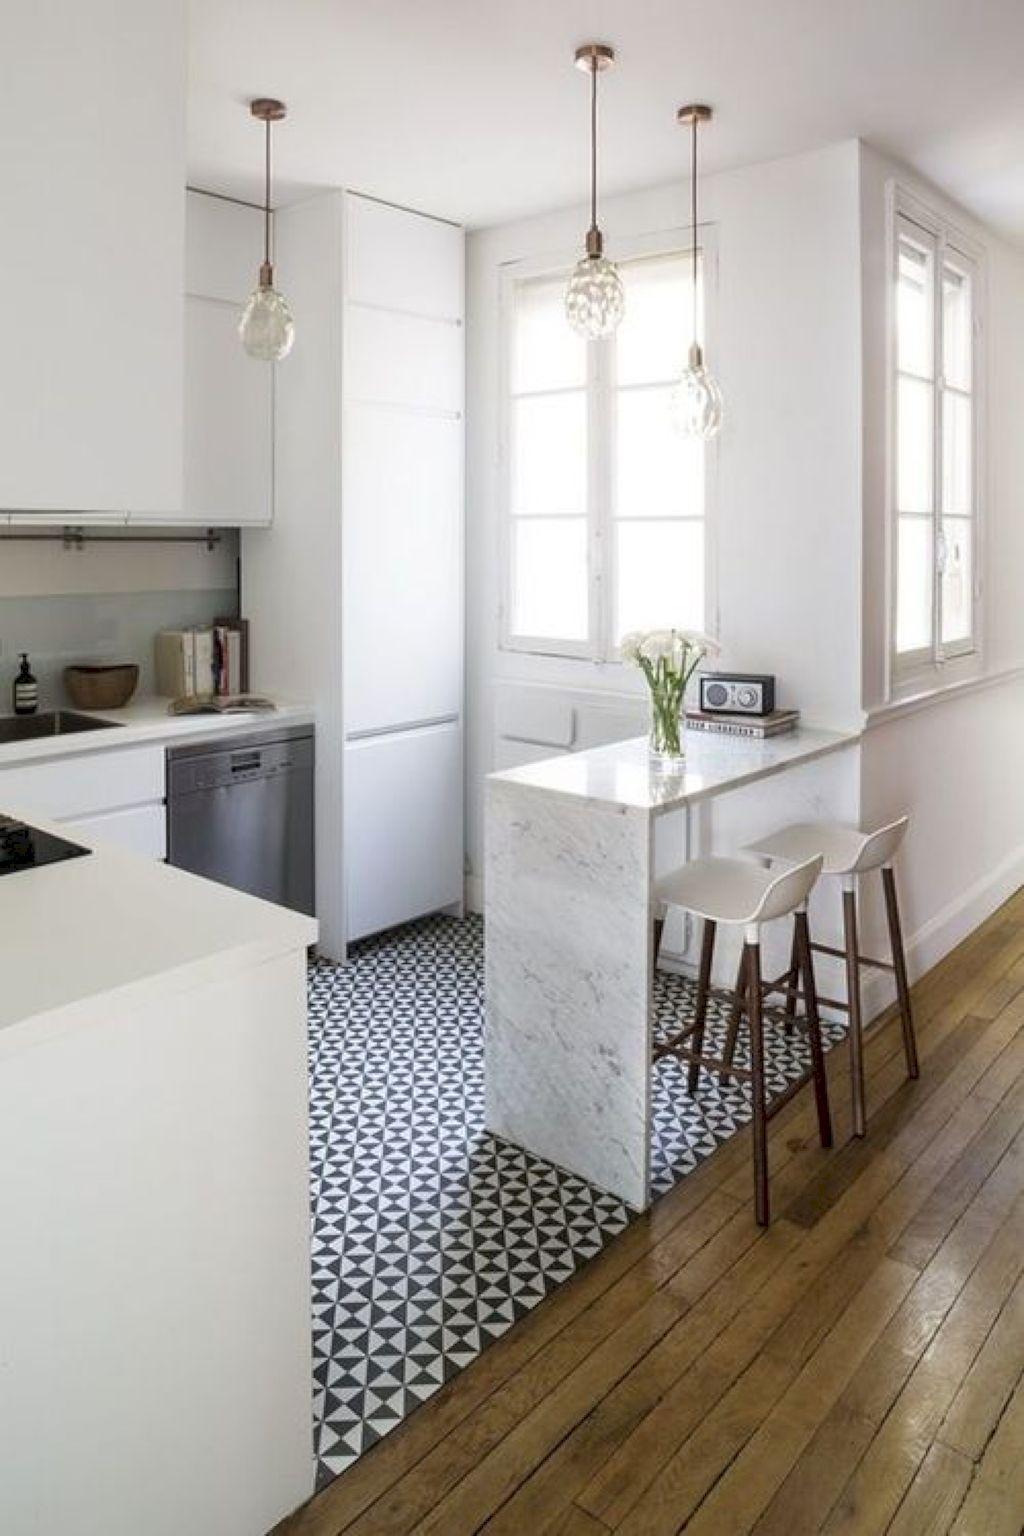 42 Smart Apartment Kitchen Remodel Ideas | Apartment kitchen ...